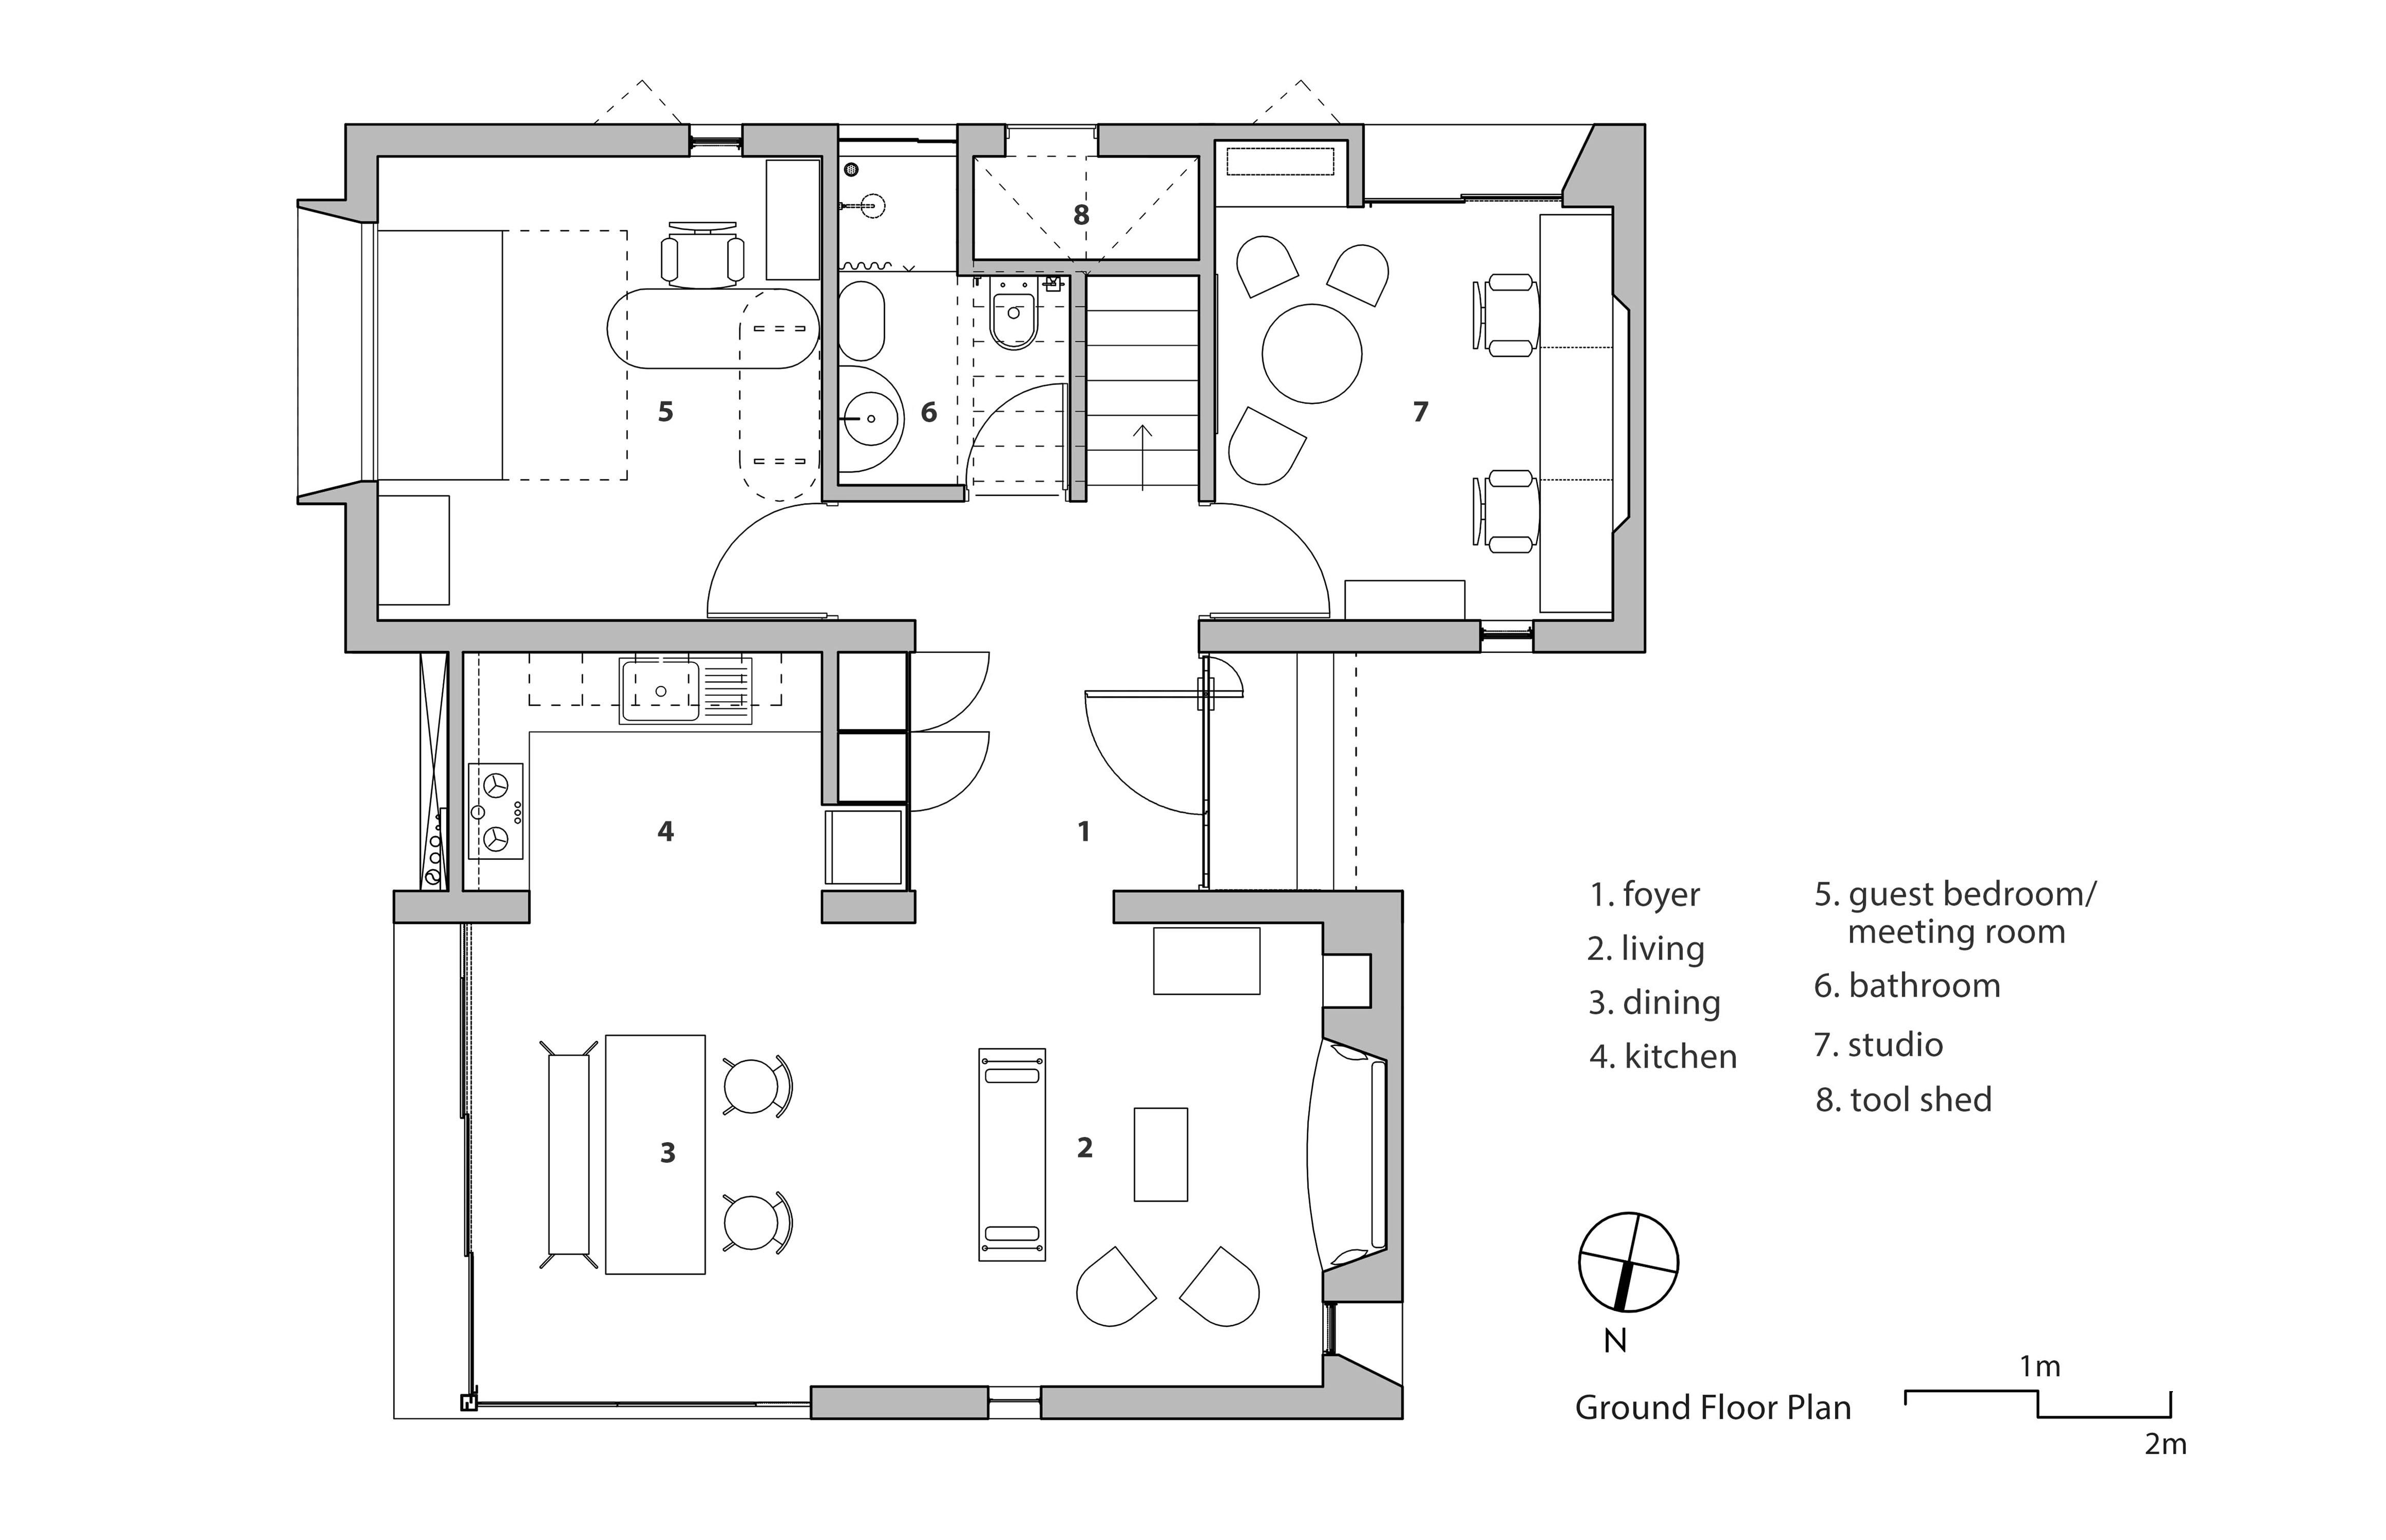 architect-own-house-kochi-gf